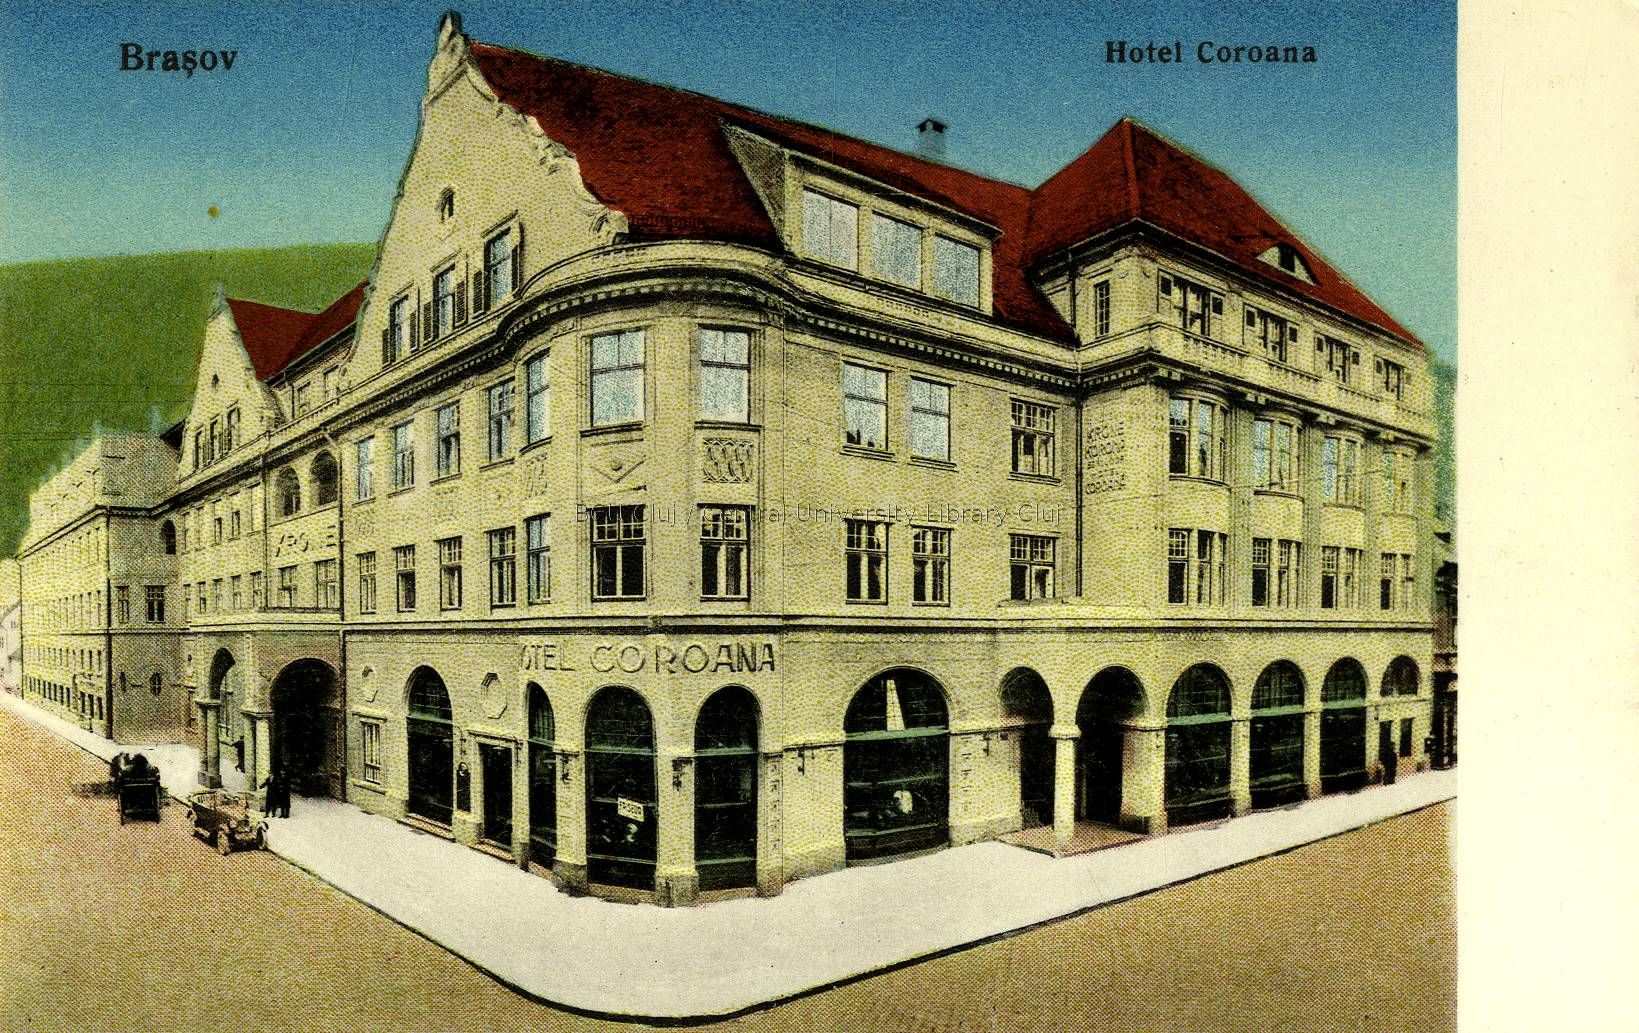 Brassó, Hotel Coroana (Lucian Blaga Central University Library, Cluj-Napoca, Románia)